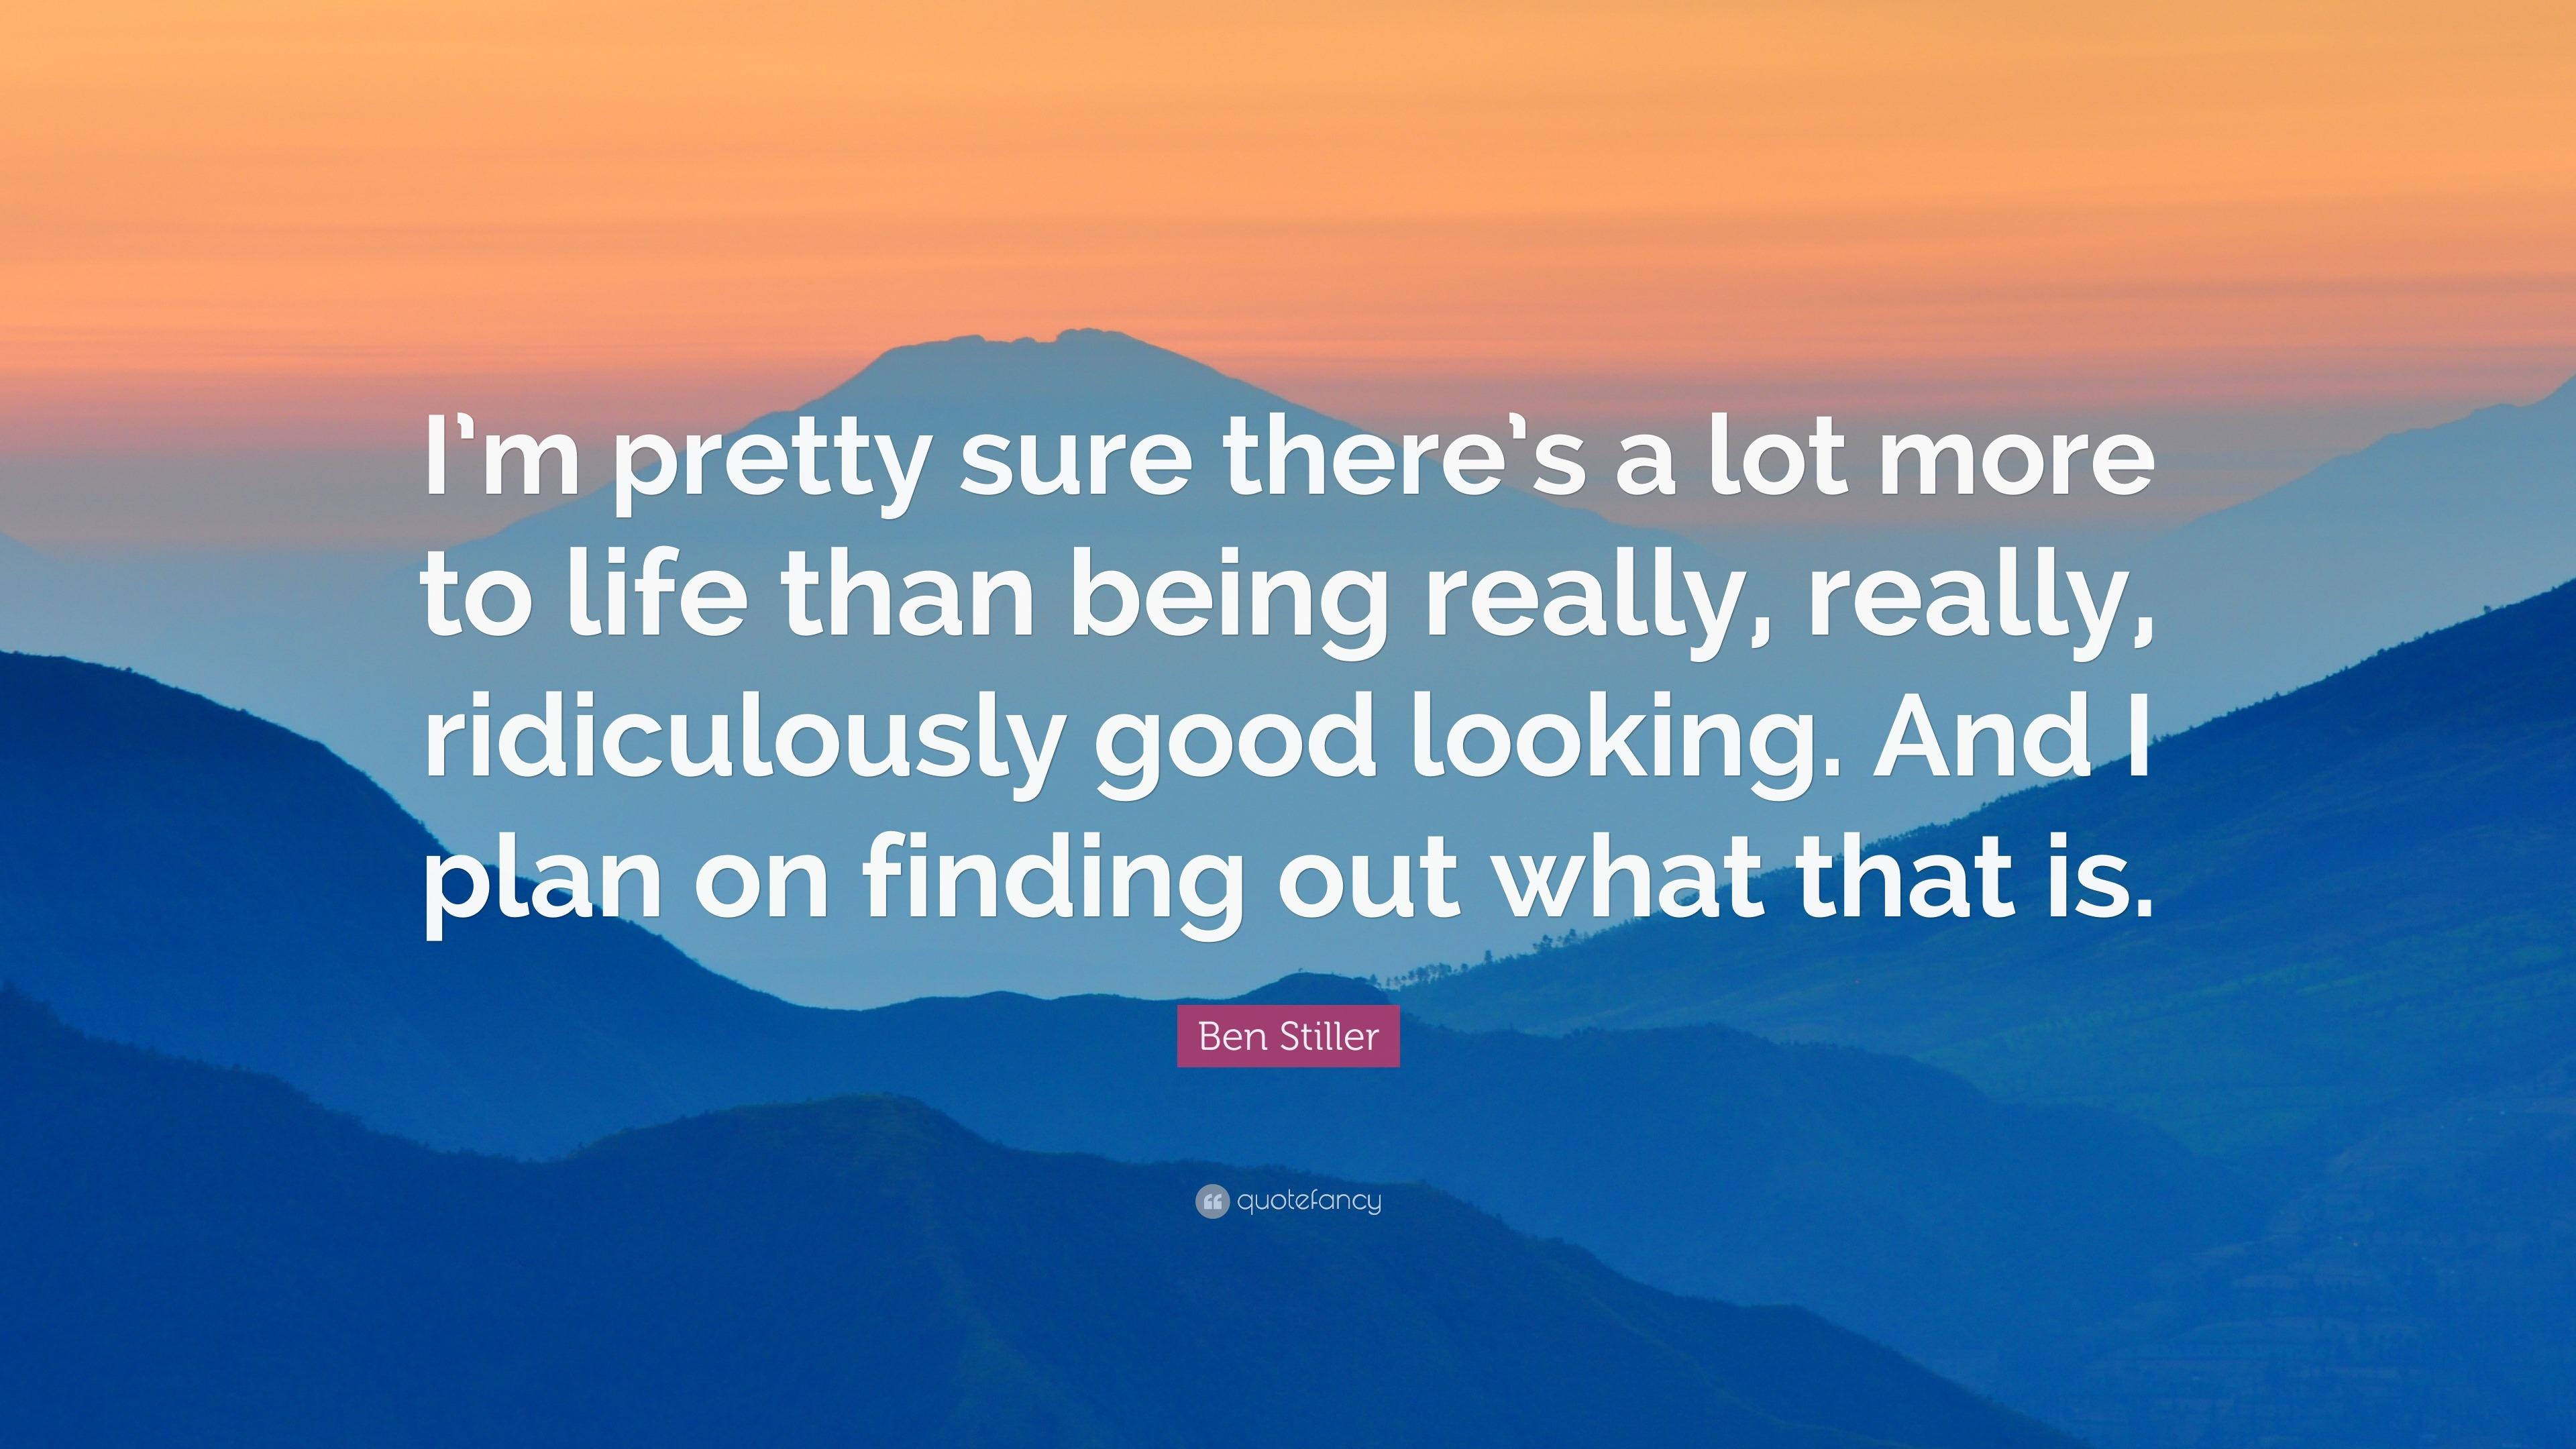 Ben Stiller Quotes (65 Wallpapers)